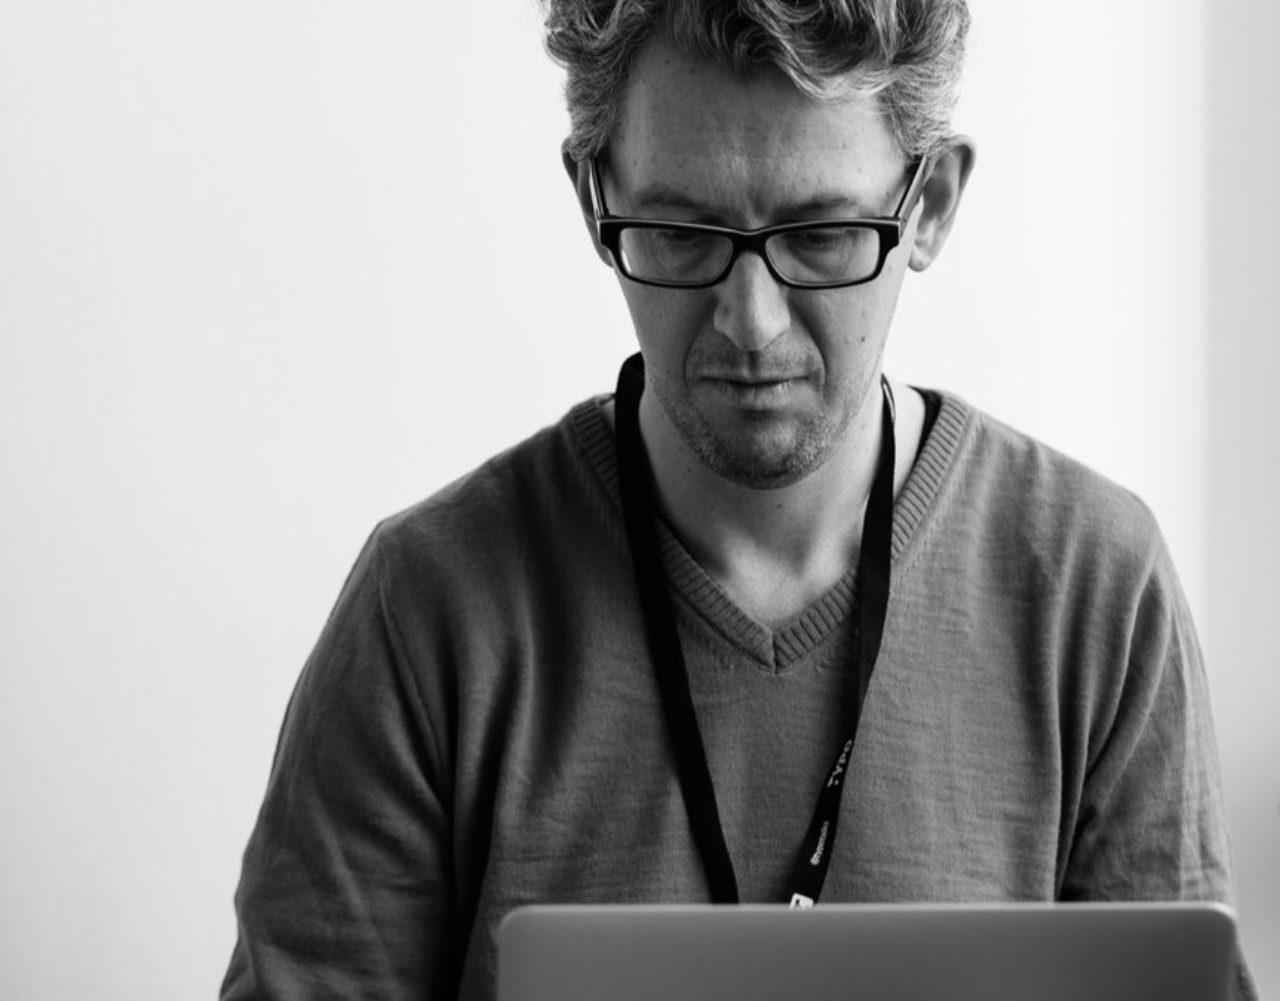 Paul van der Laan, teacher at TypeMedia Royal Academy of Art The Hague